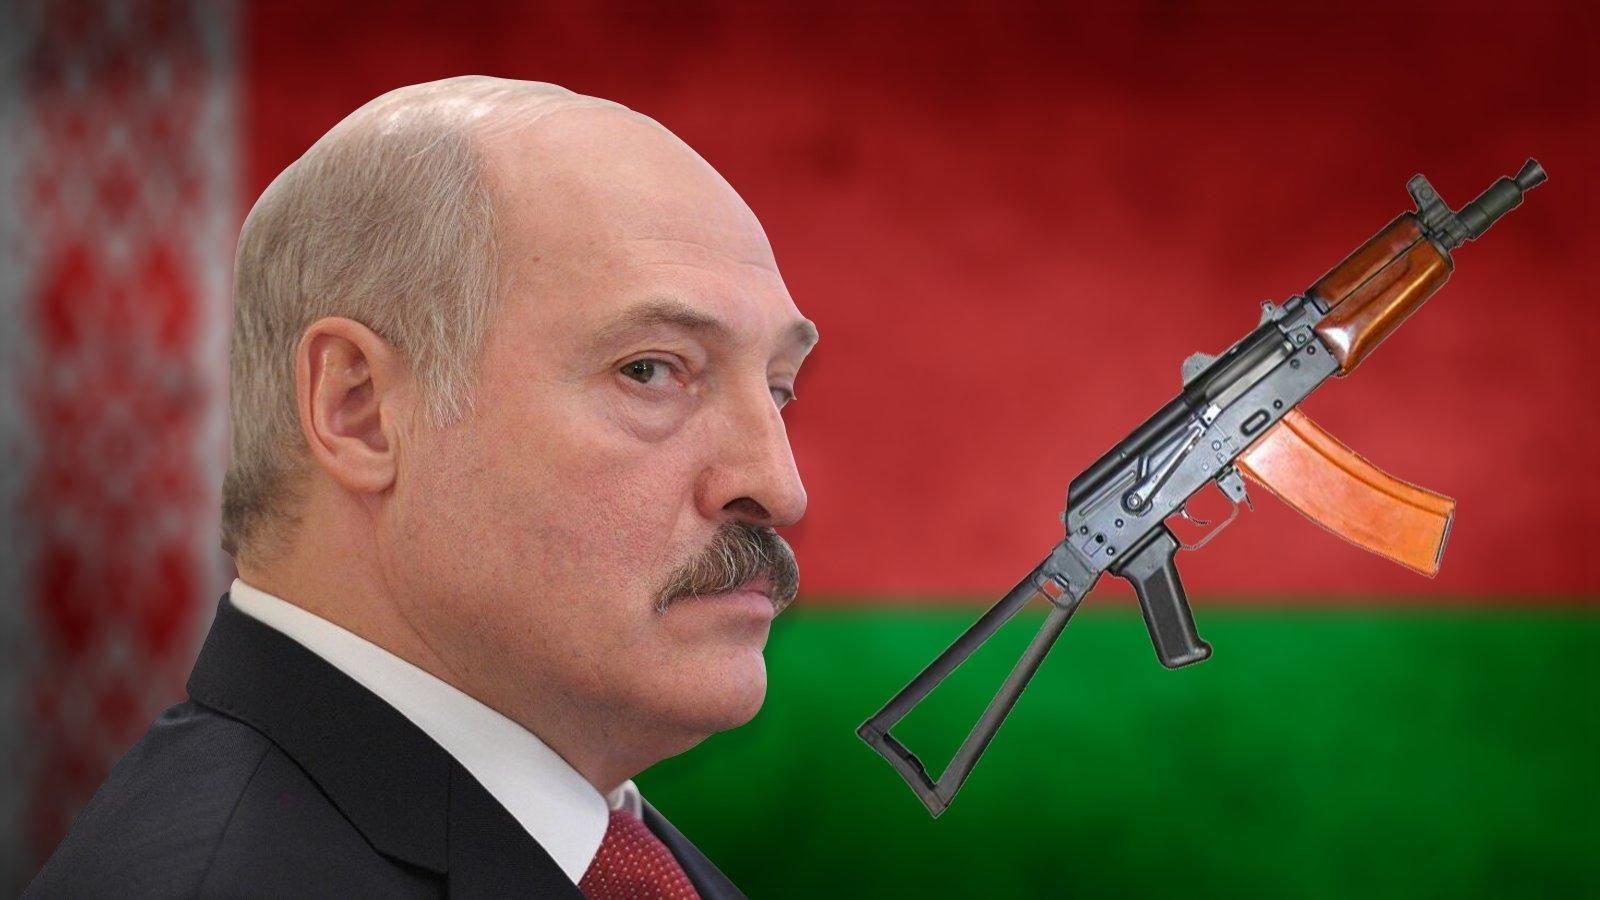 Вассерман о действиях Лукашенко: Батька опять всех переиграл 1